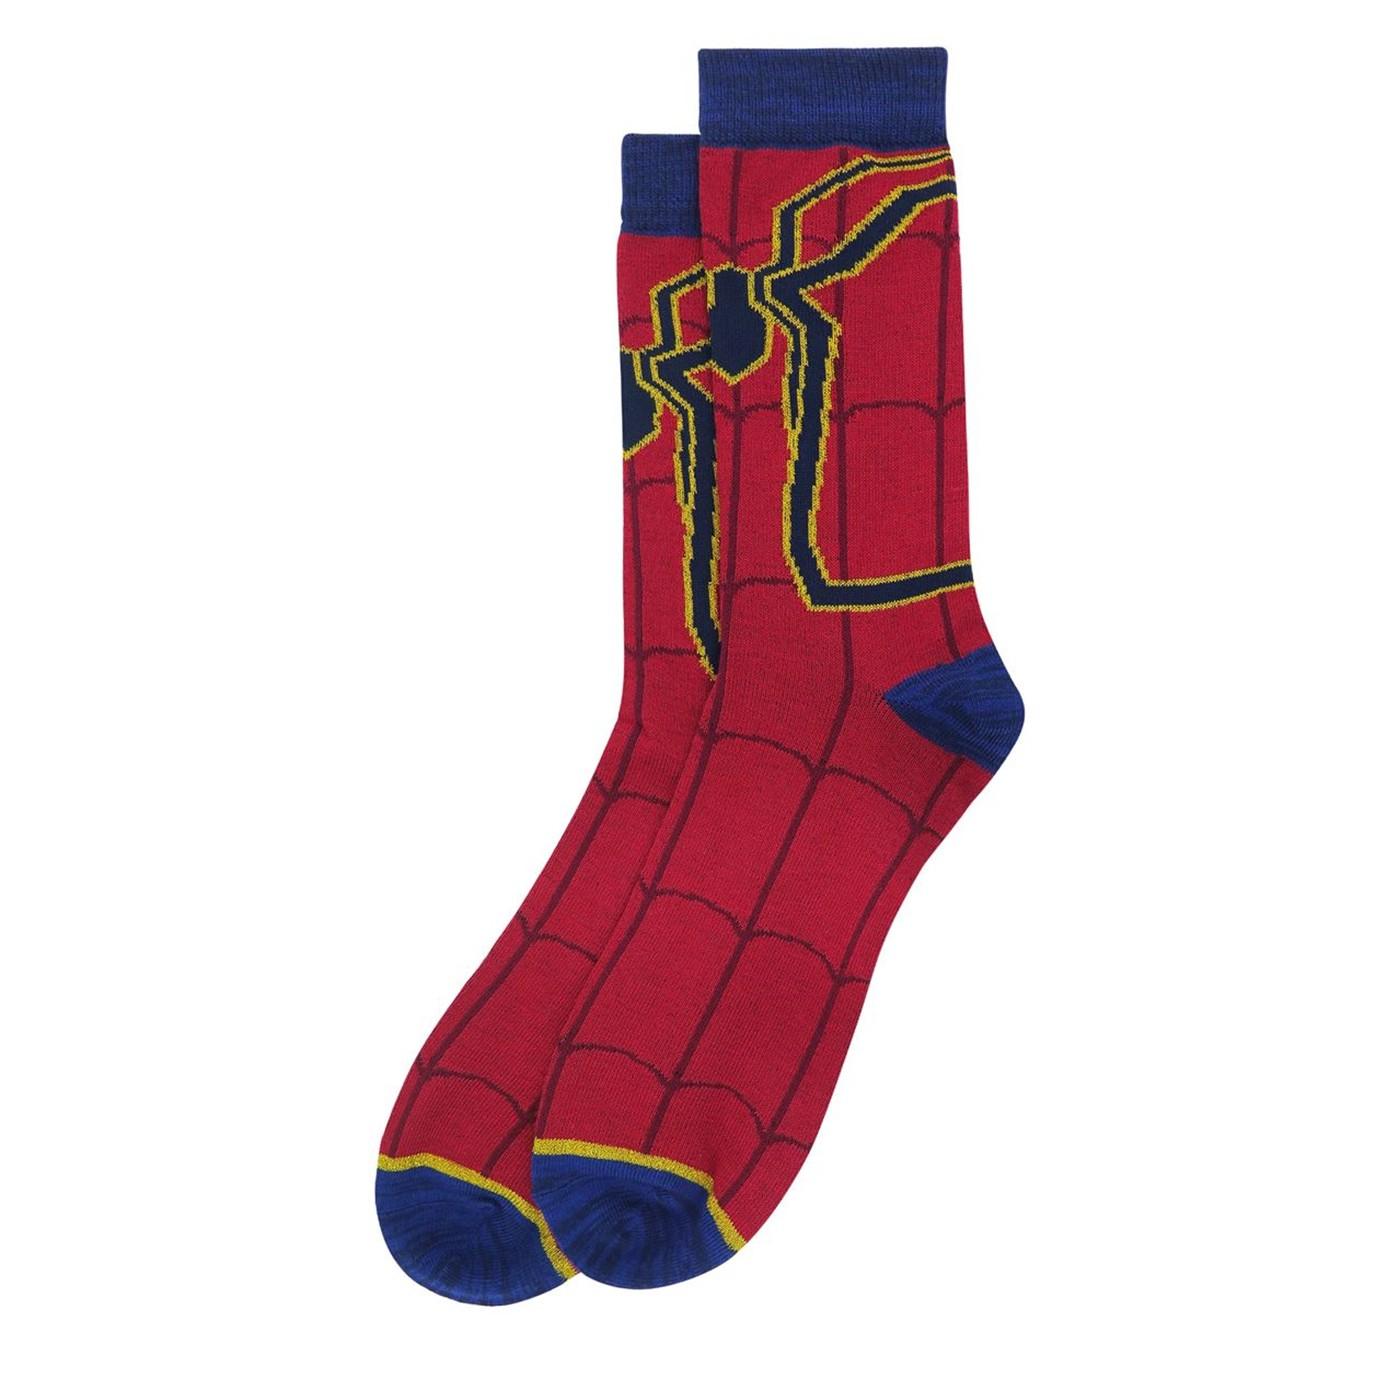 Avengers Infinity War Iron Spider Crew Socks